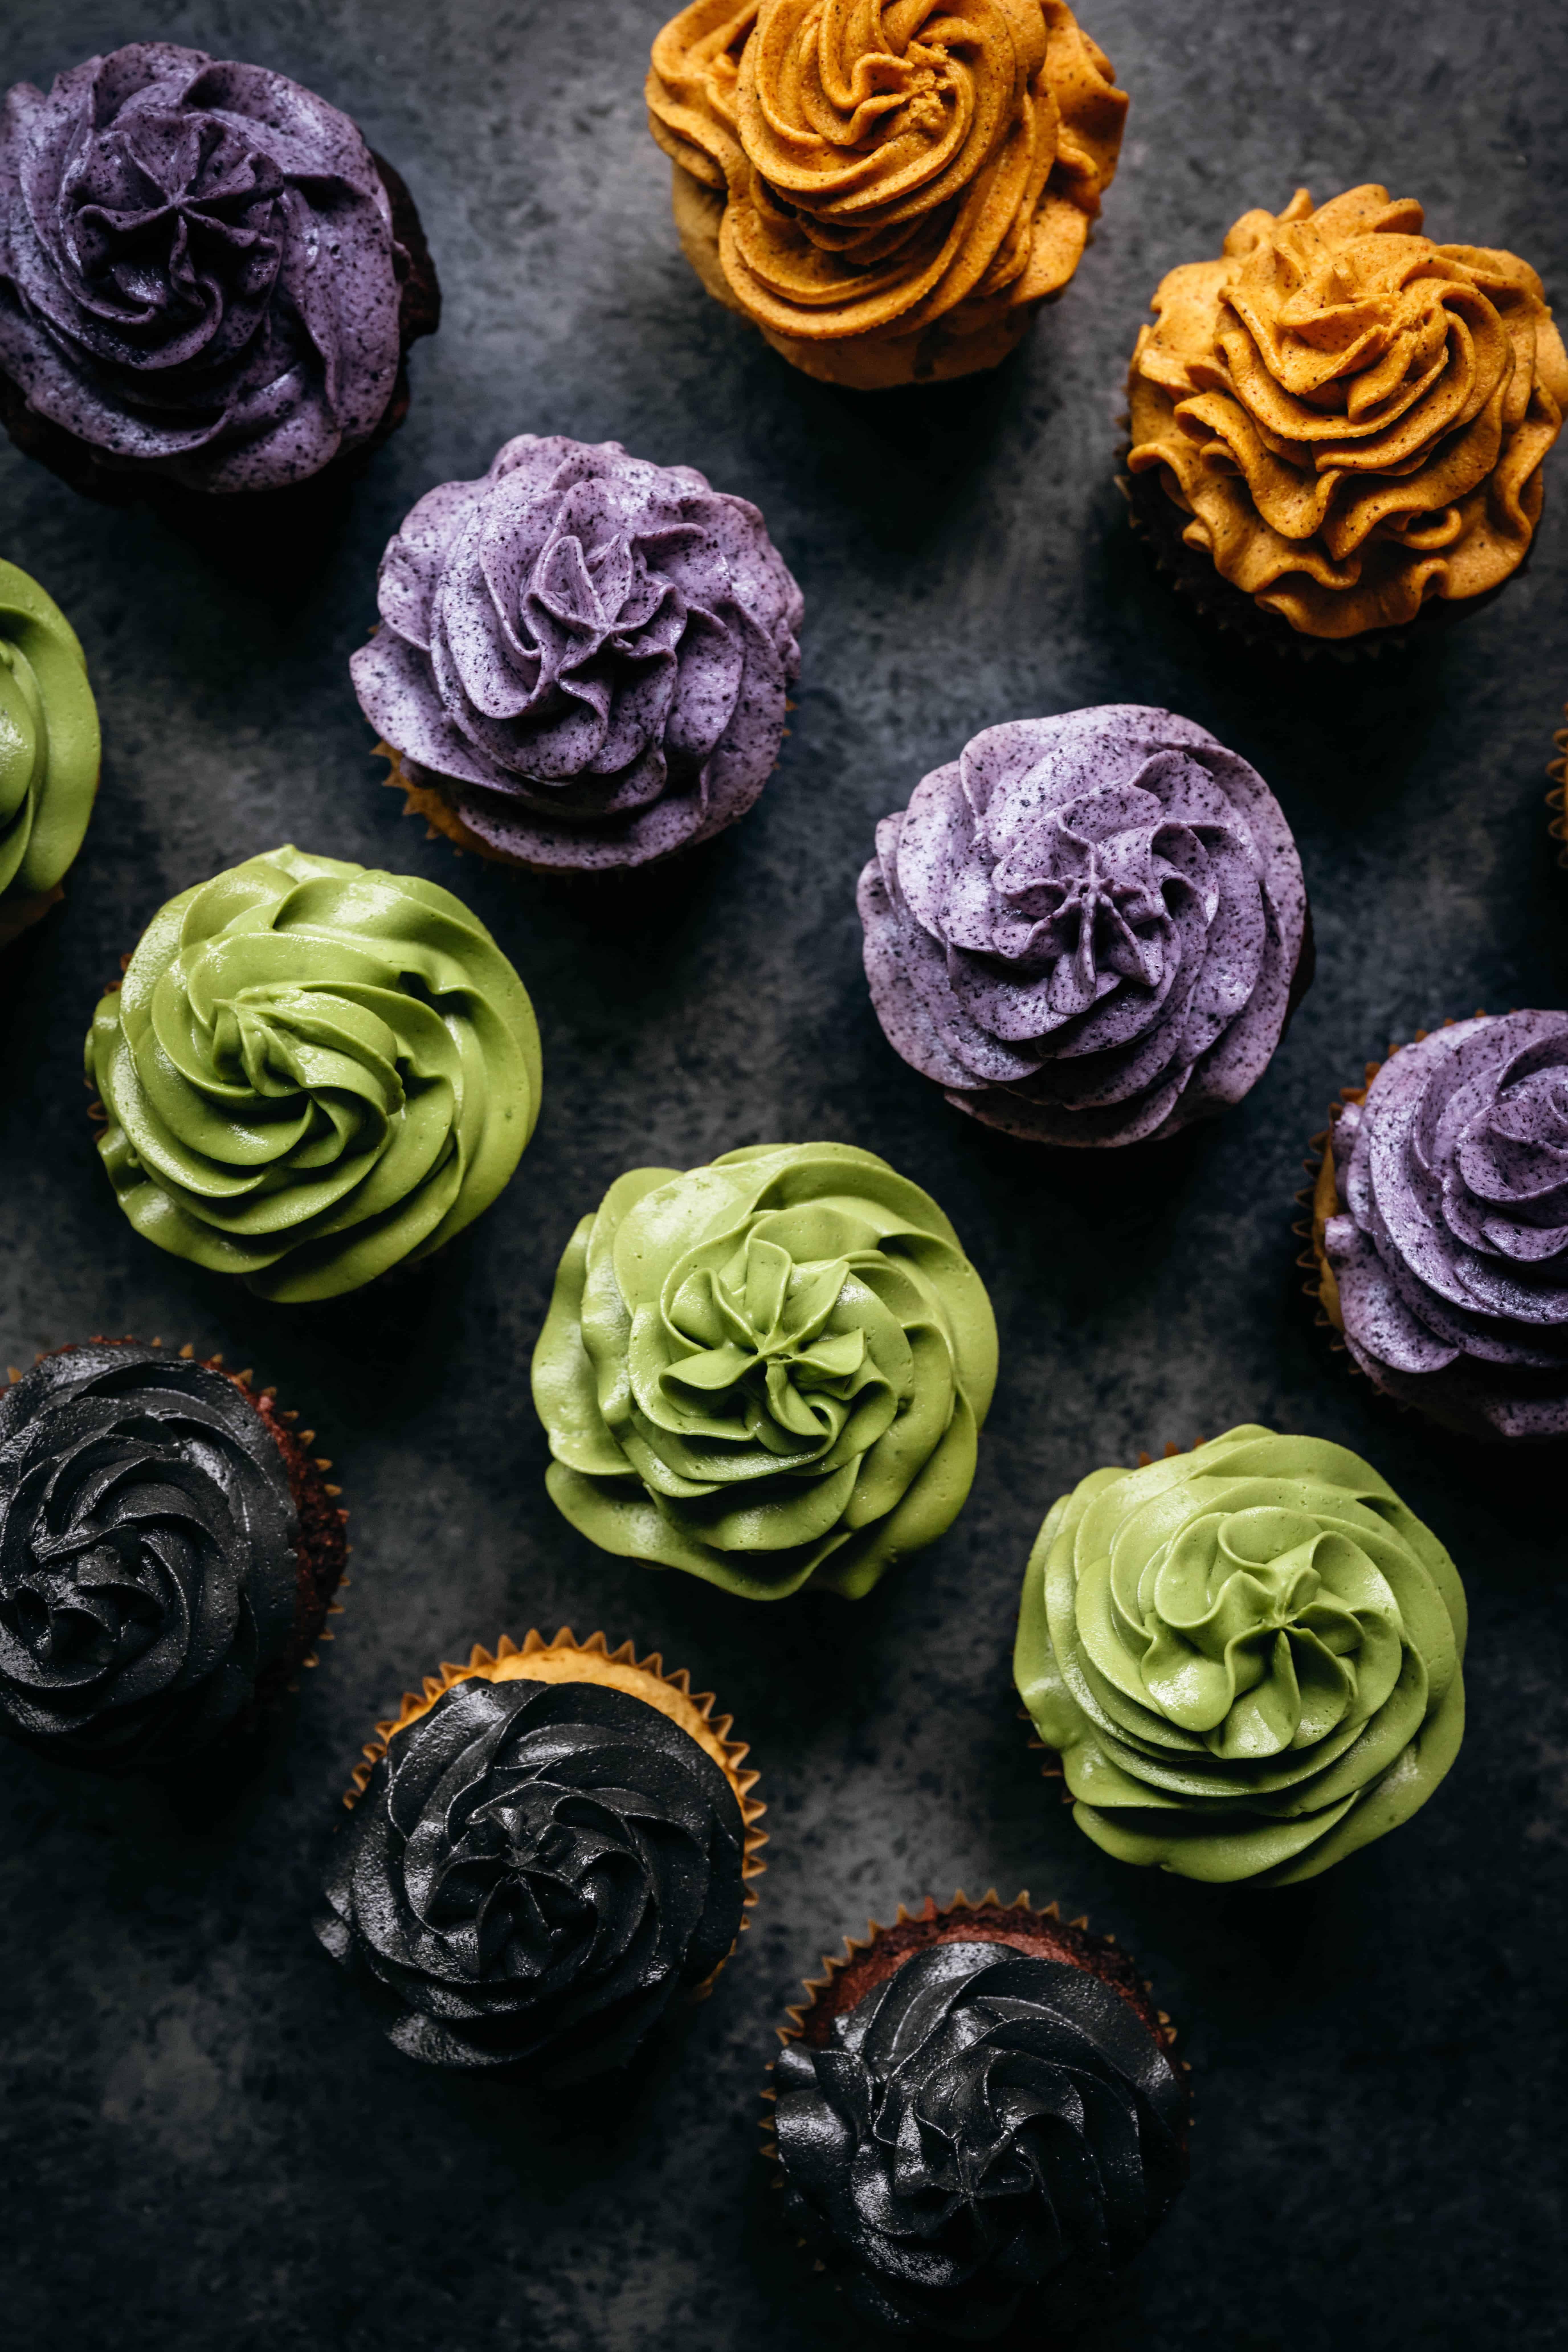 Natural Vegan Food Coloring For Frosting